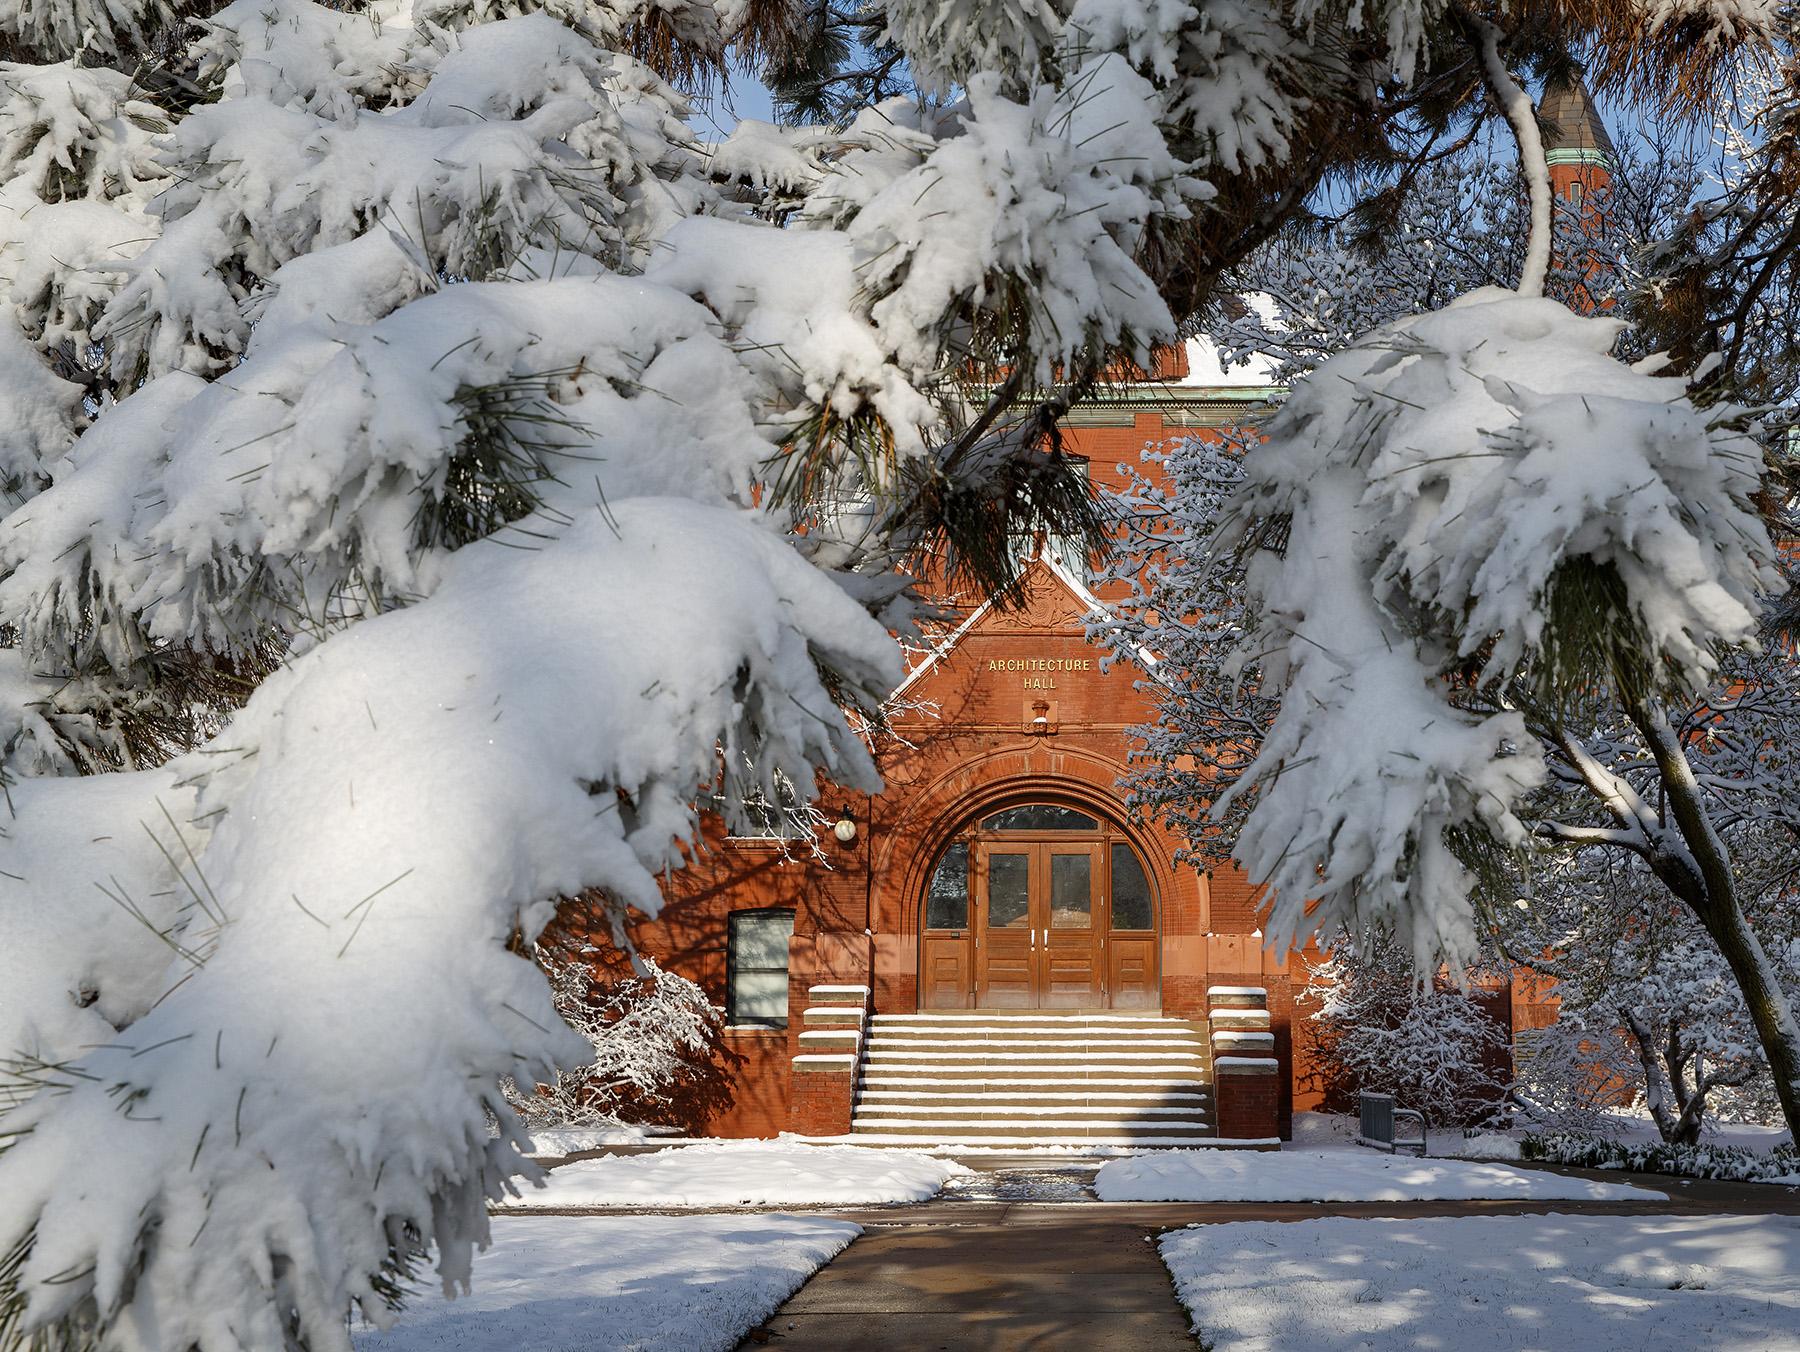 April snow storm leaves campus unseasonably beautiful. April 17, 2020. Photo by Craig Chandler / University Communication